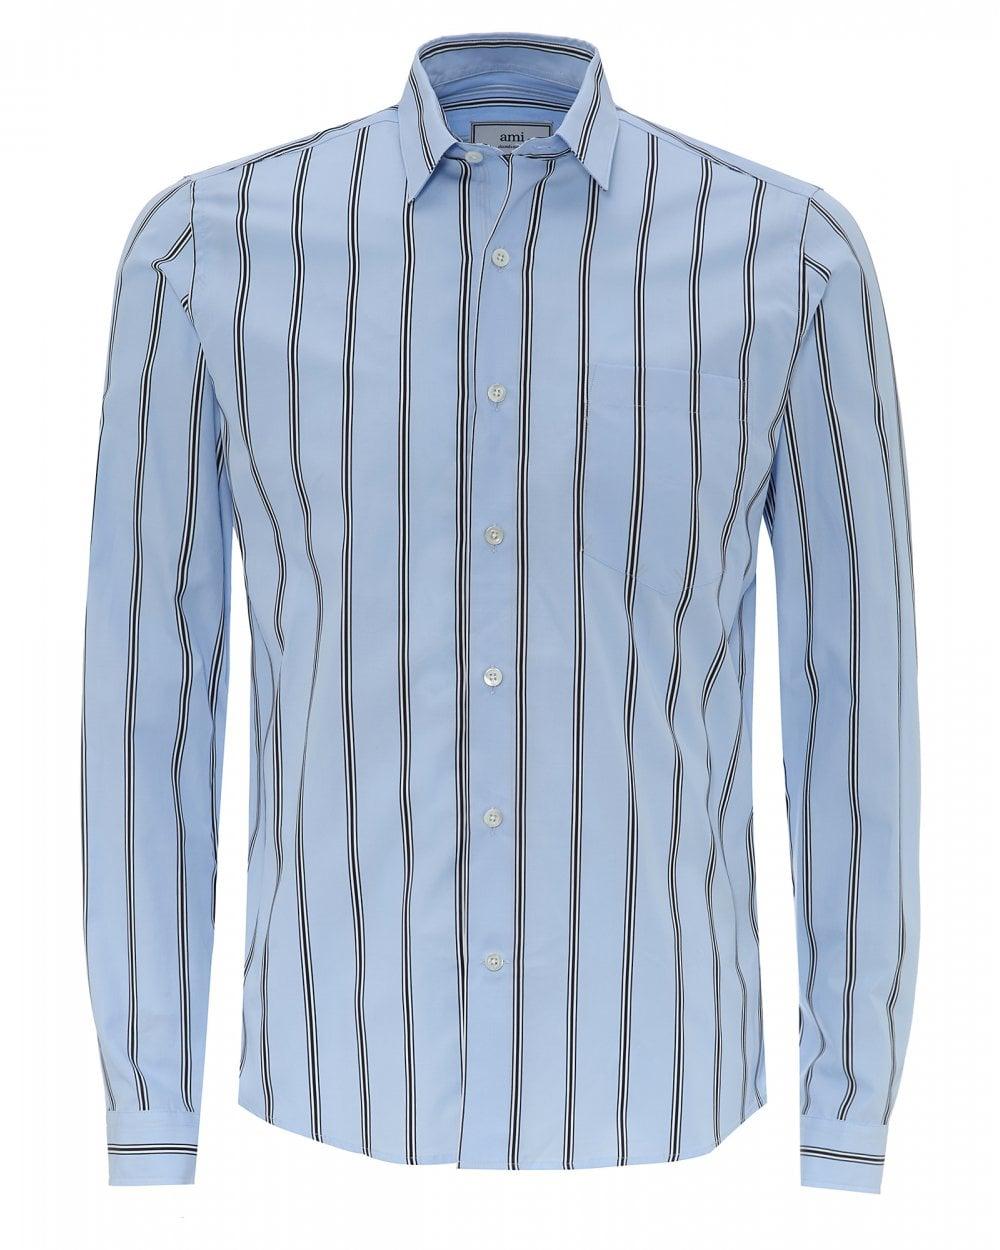 7c121b54a0 Ami Mens Sky Blue Striped Cotton Poplin Shirt